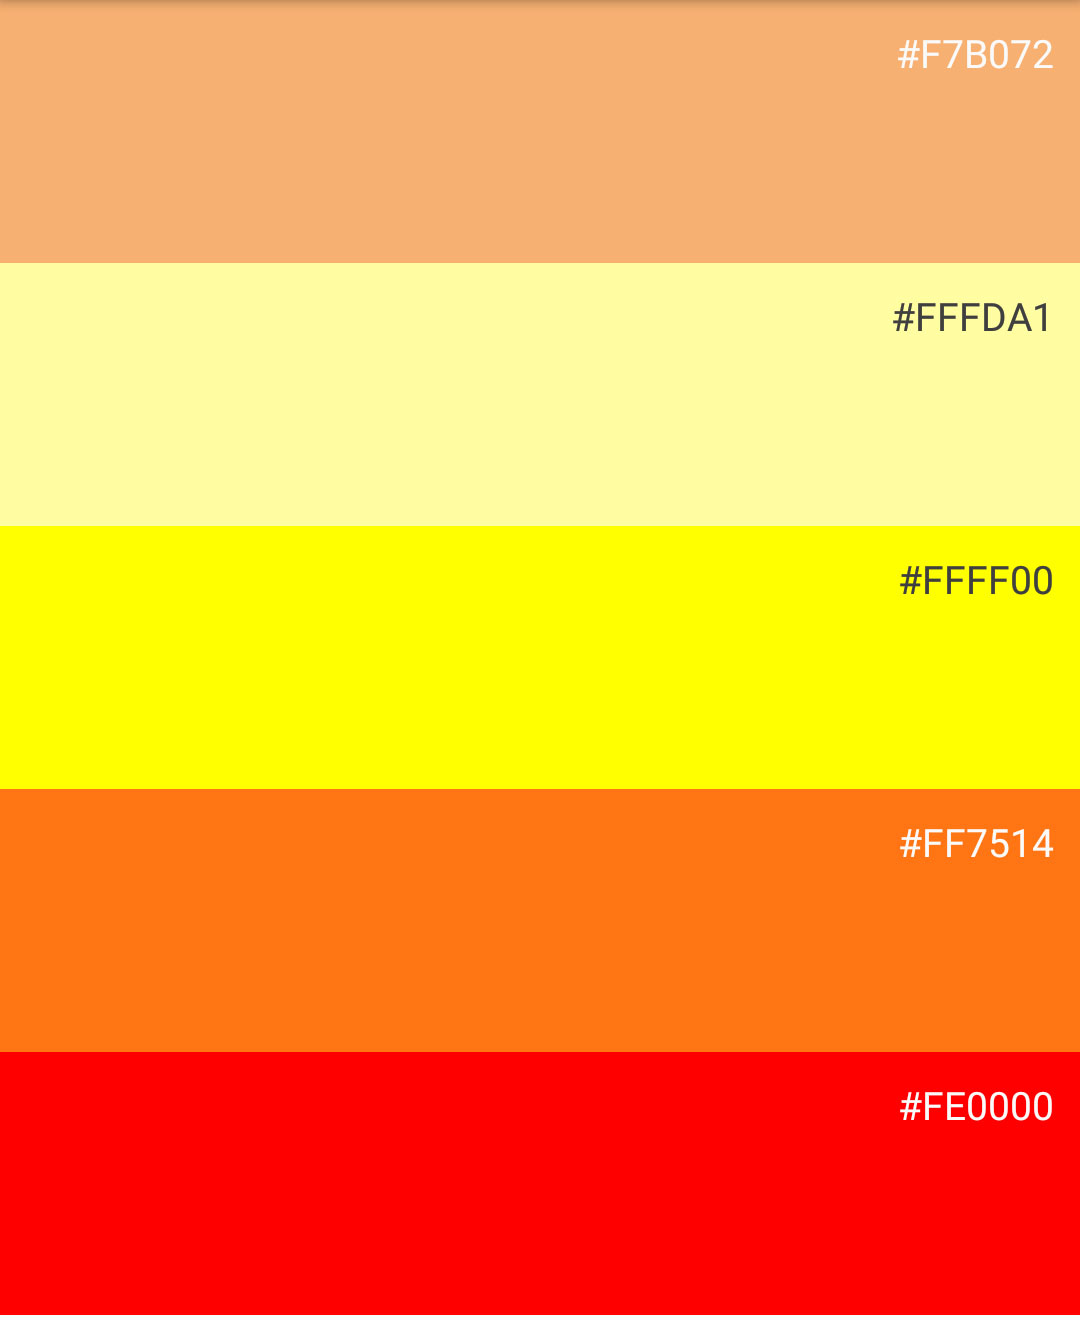 analogous-red-yellow-orangescolorblock.jpg